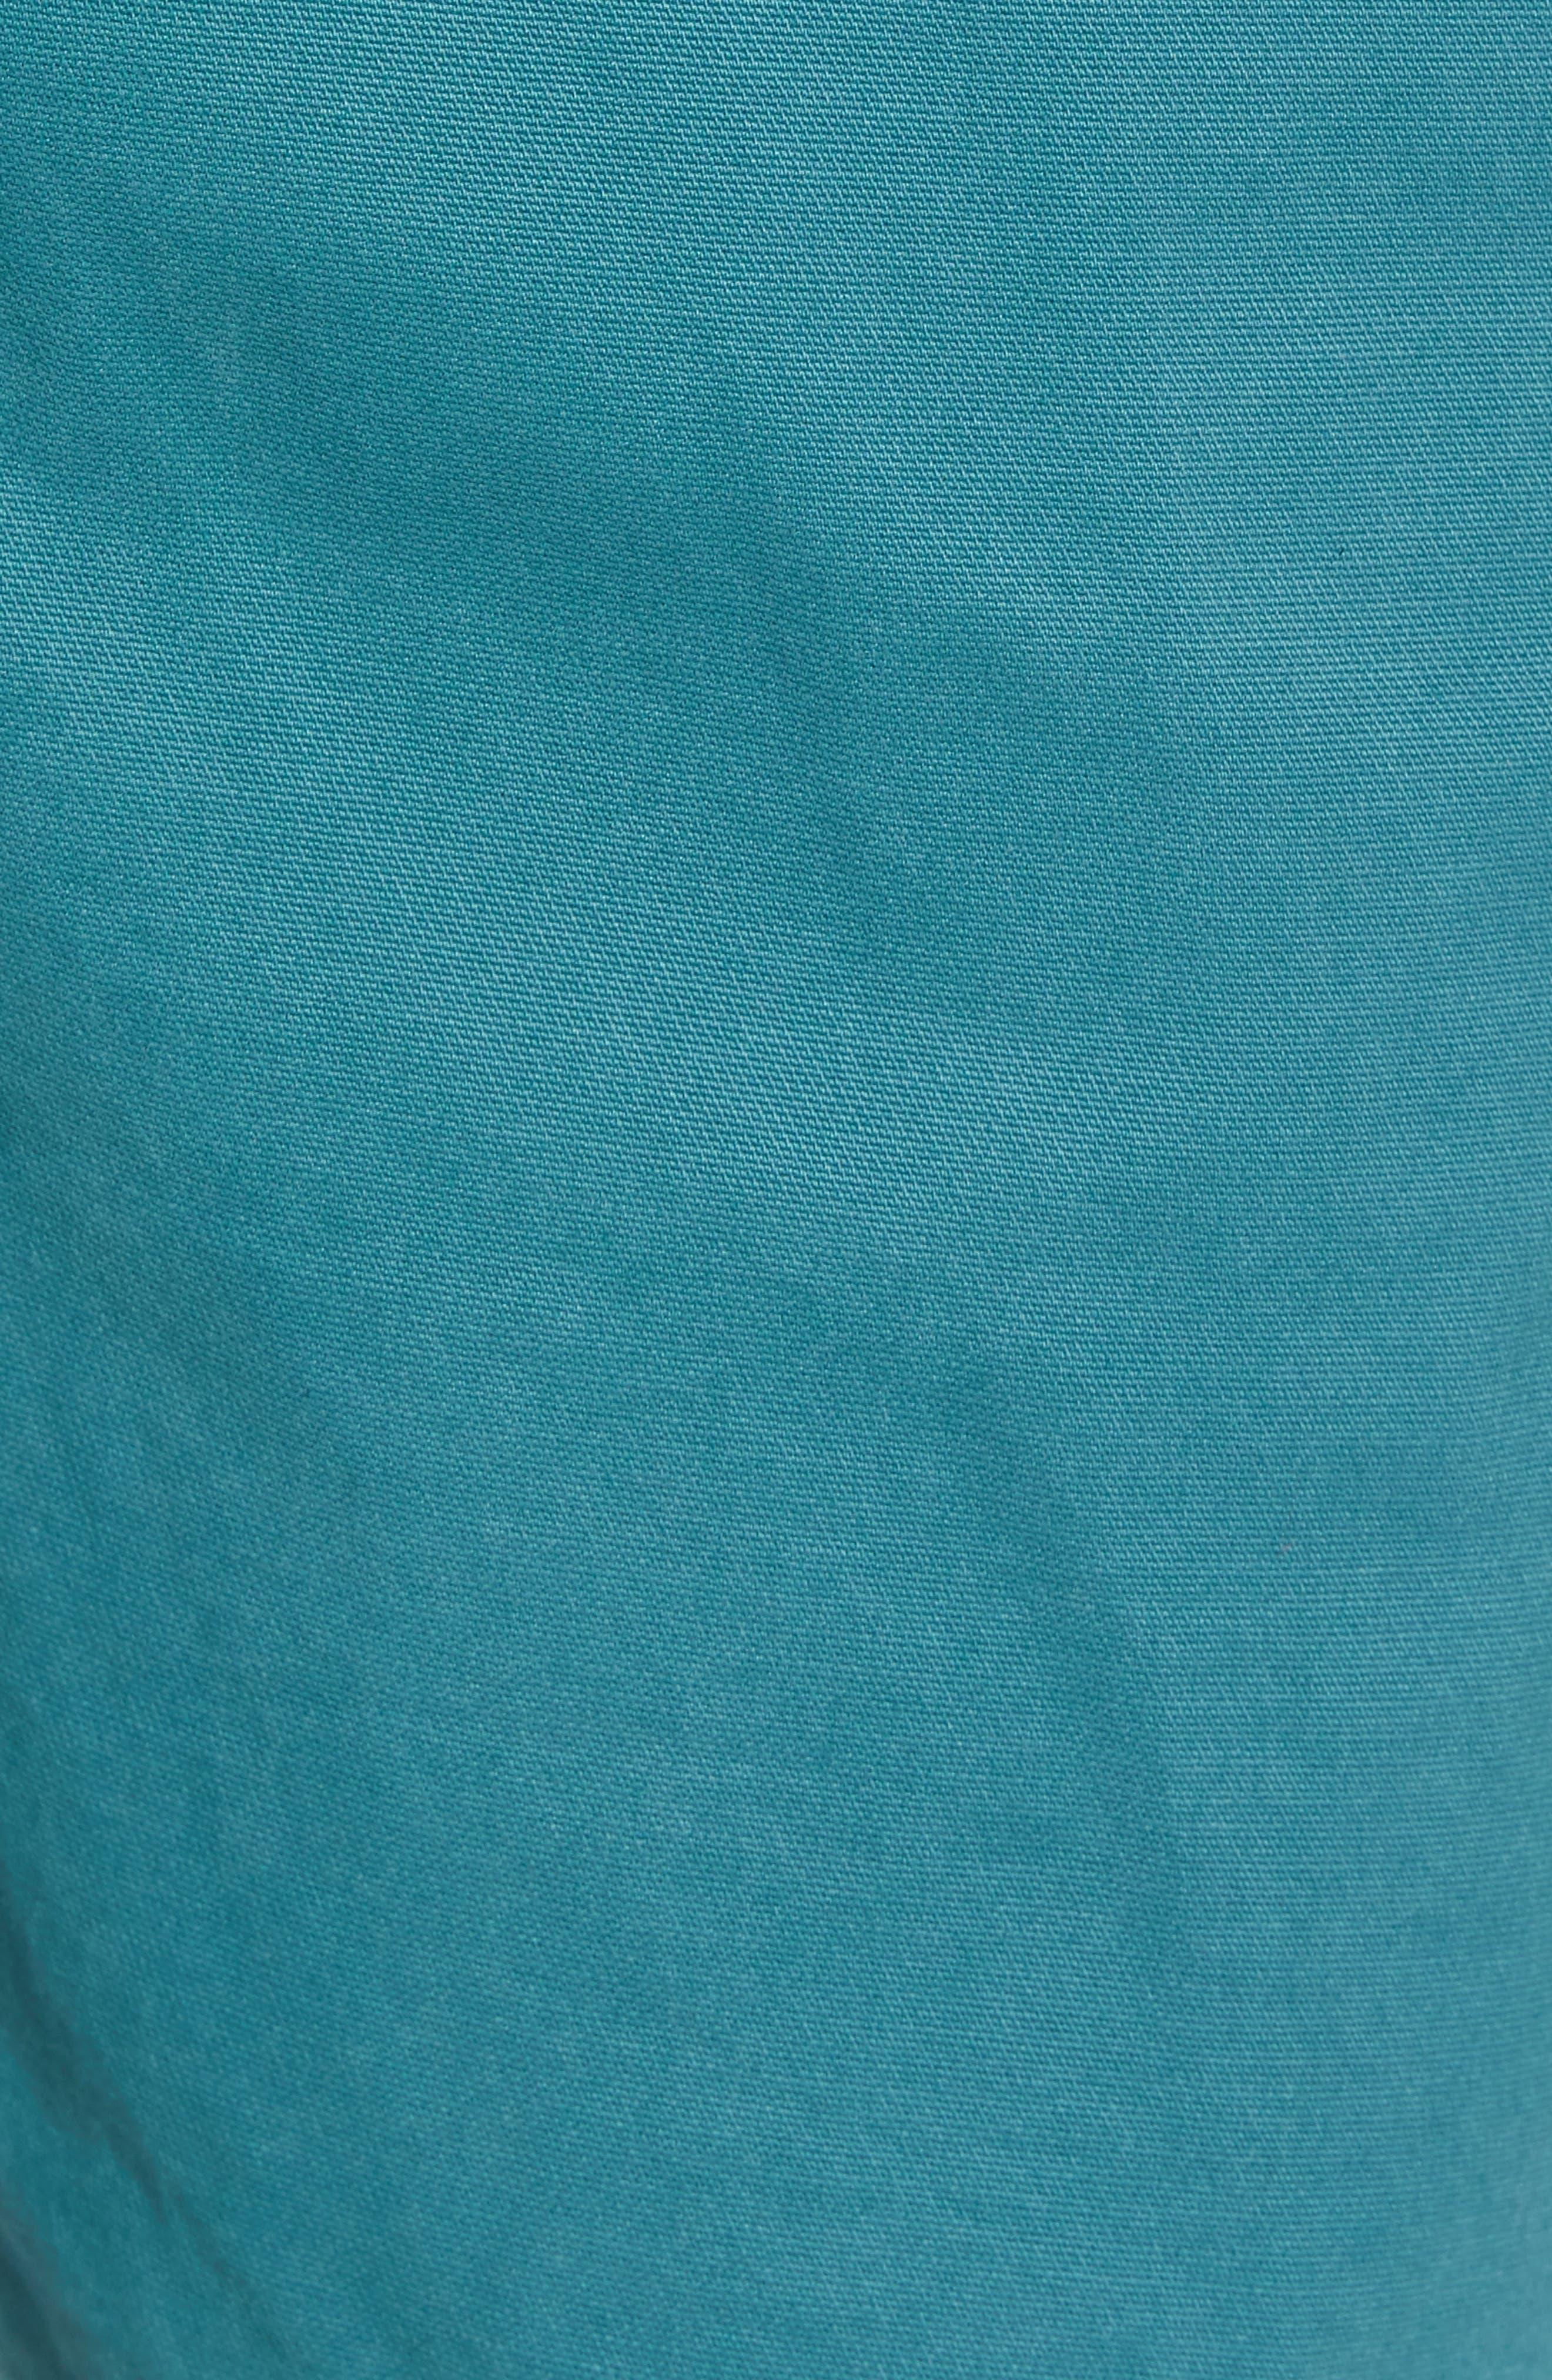 New Order Shorts,                             Alternate thumbnail 5, color,                             Hydro